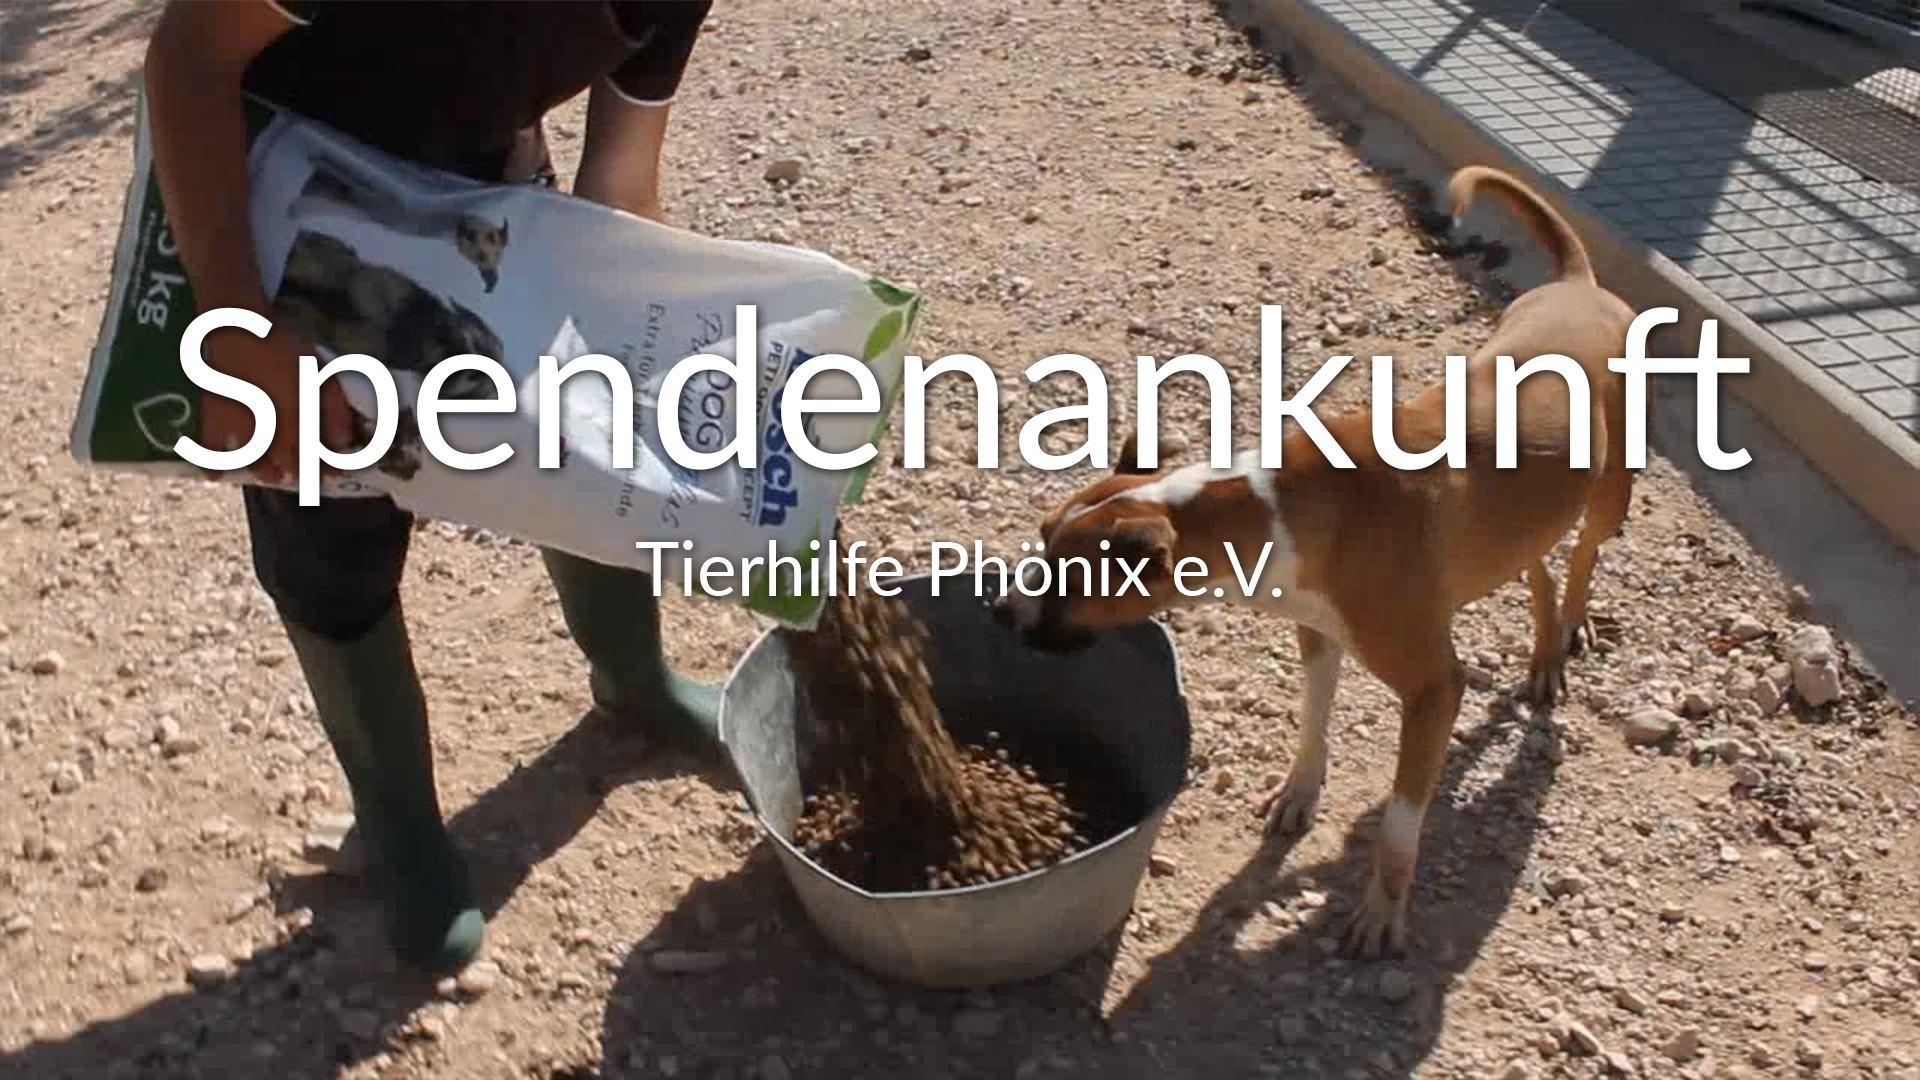 Tierhilfe Phönix e.V.-Futterspendenankunft-september 2019-Spendenaktion-Sommerloch-Spanien VIDEO-1